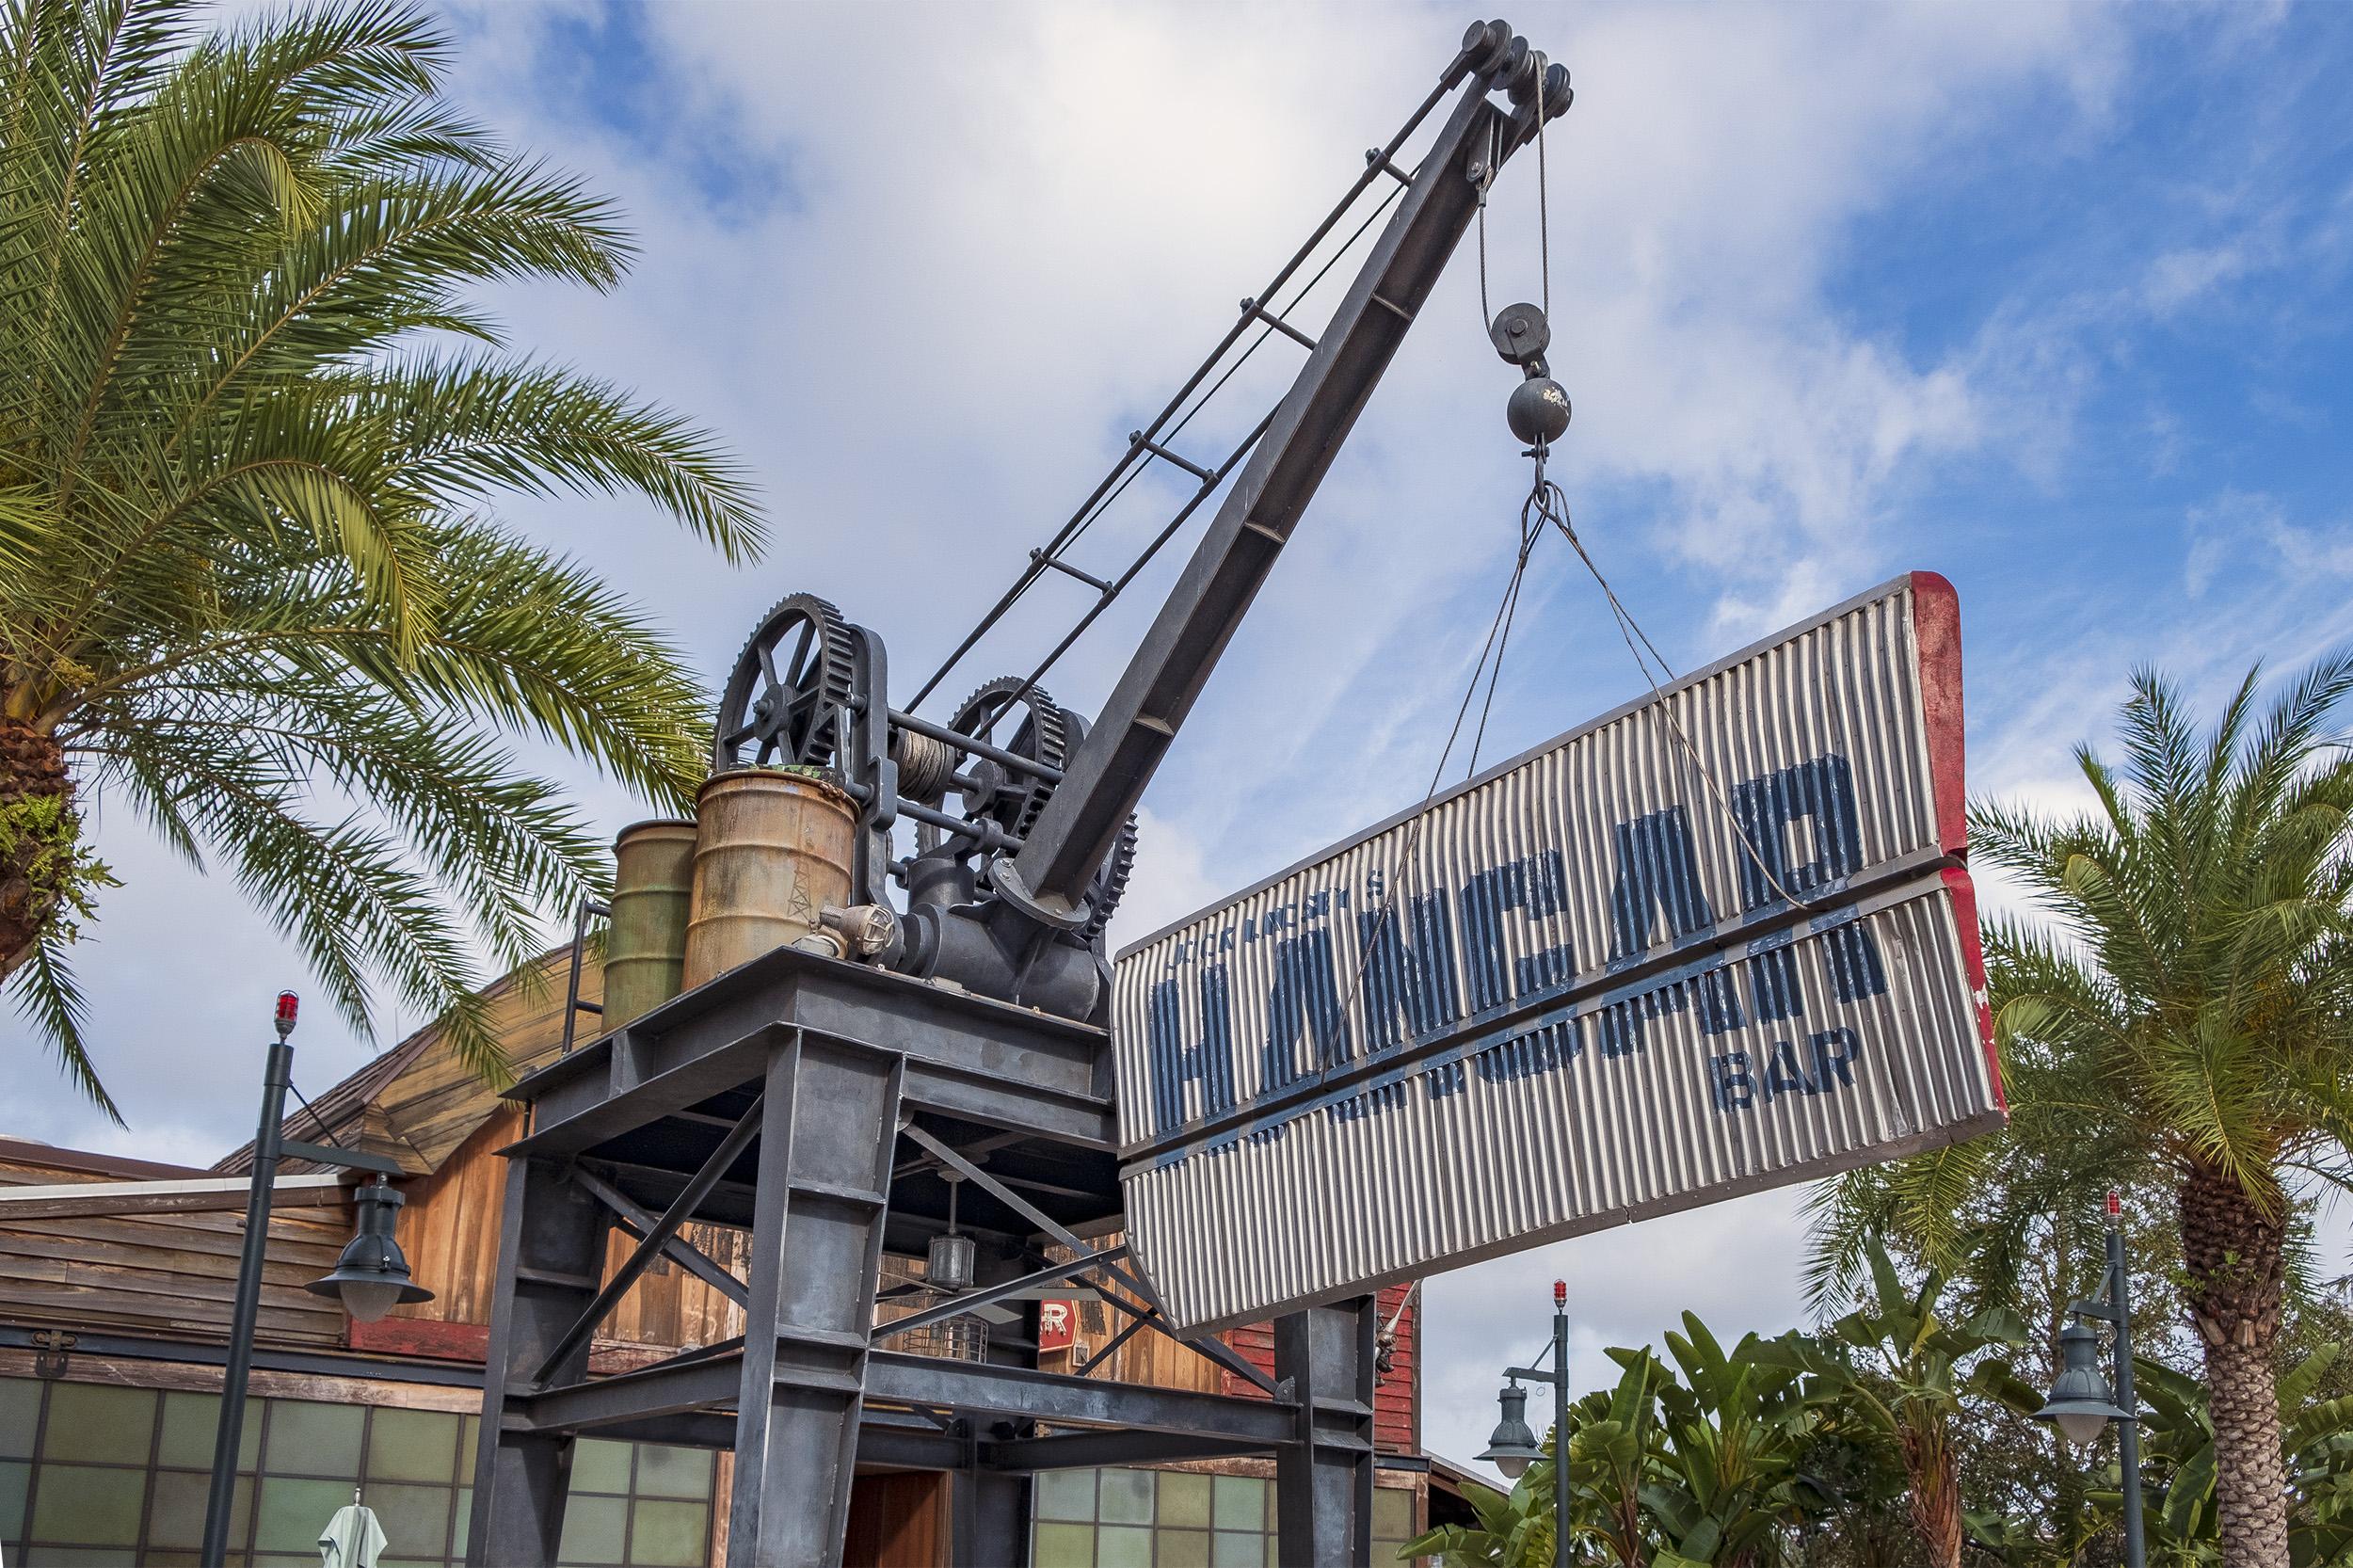 The Hangar Bar Disney Springs